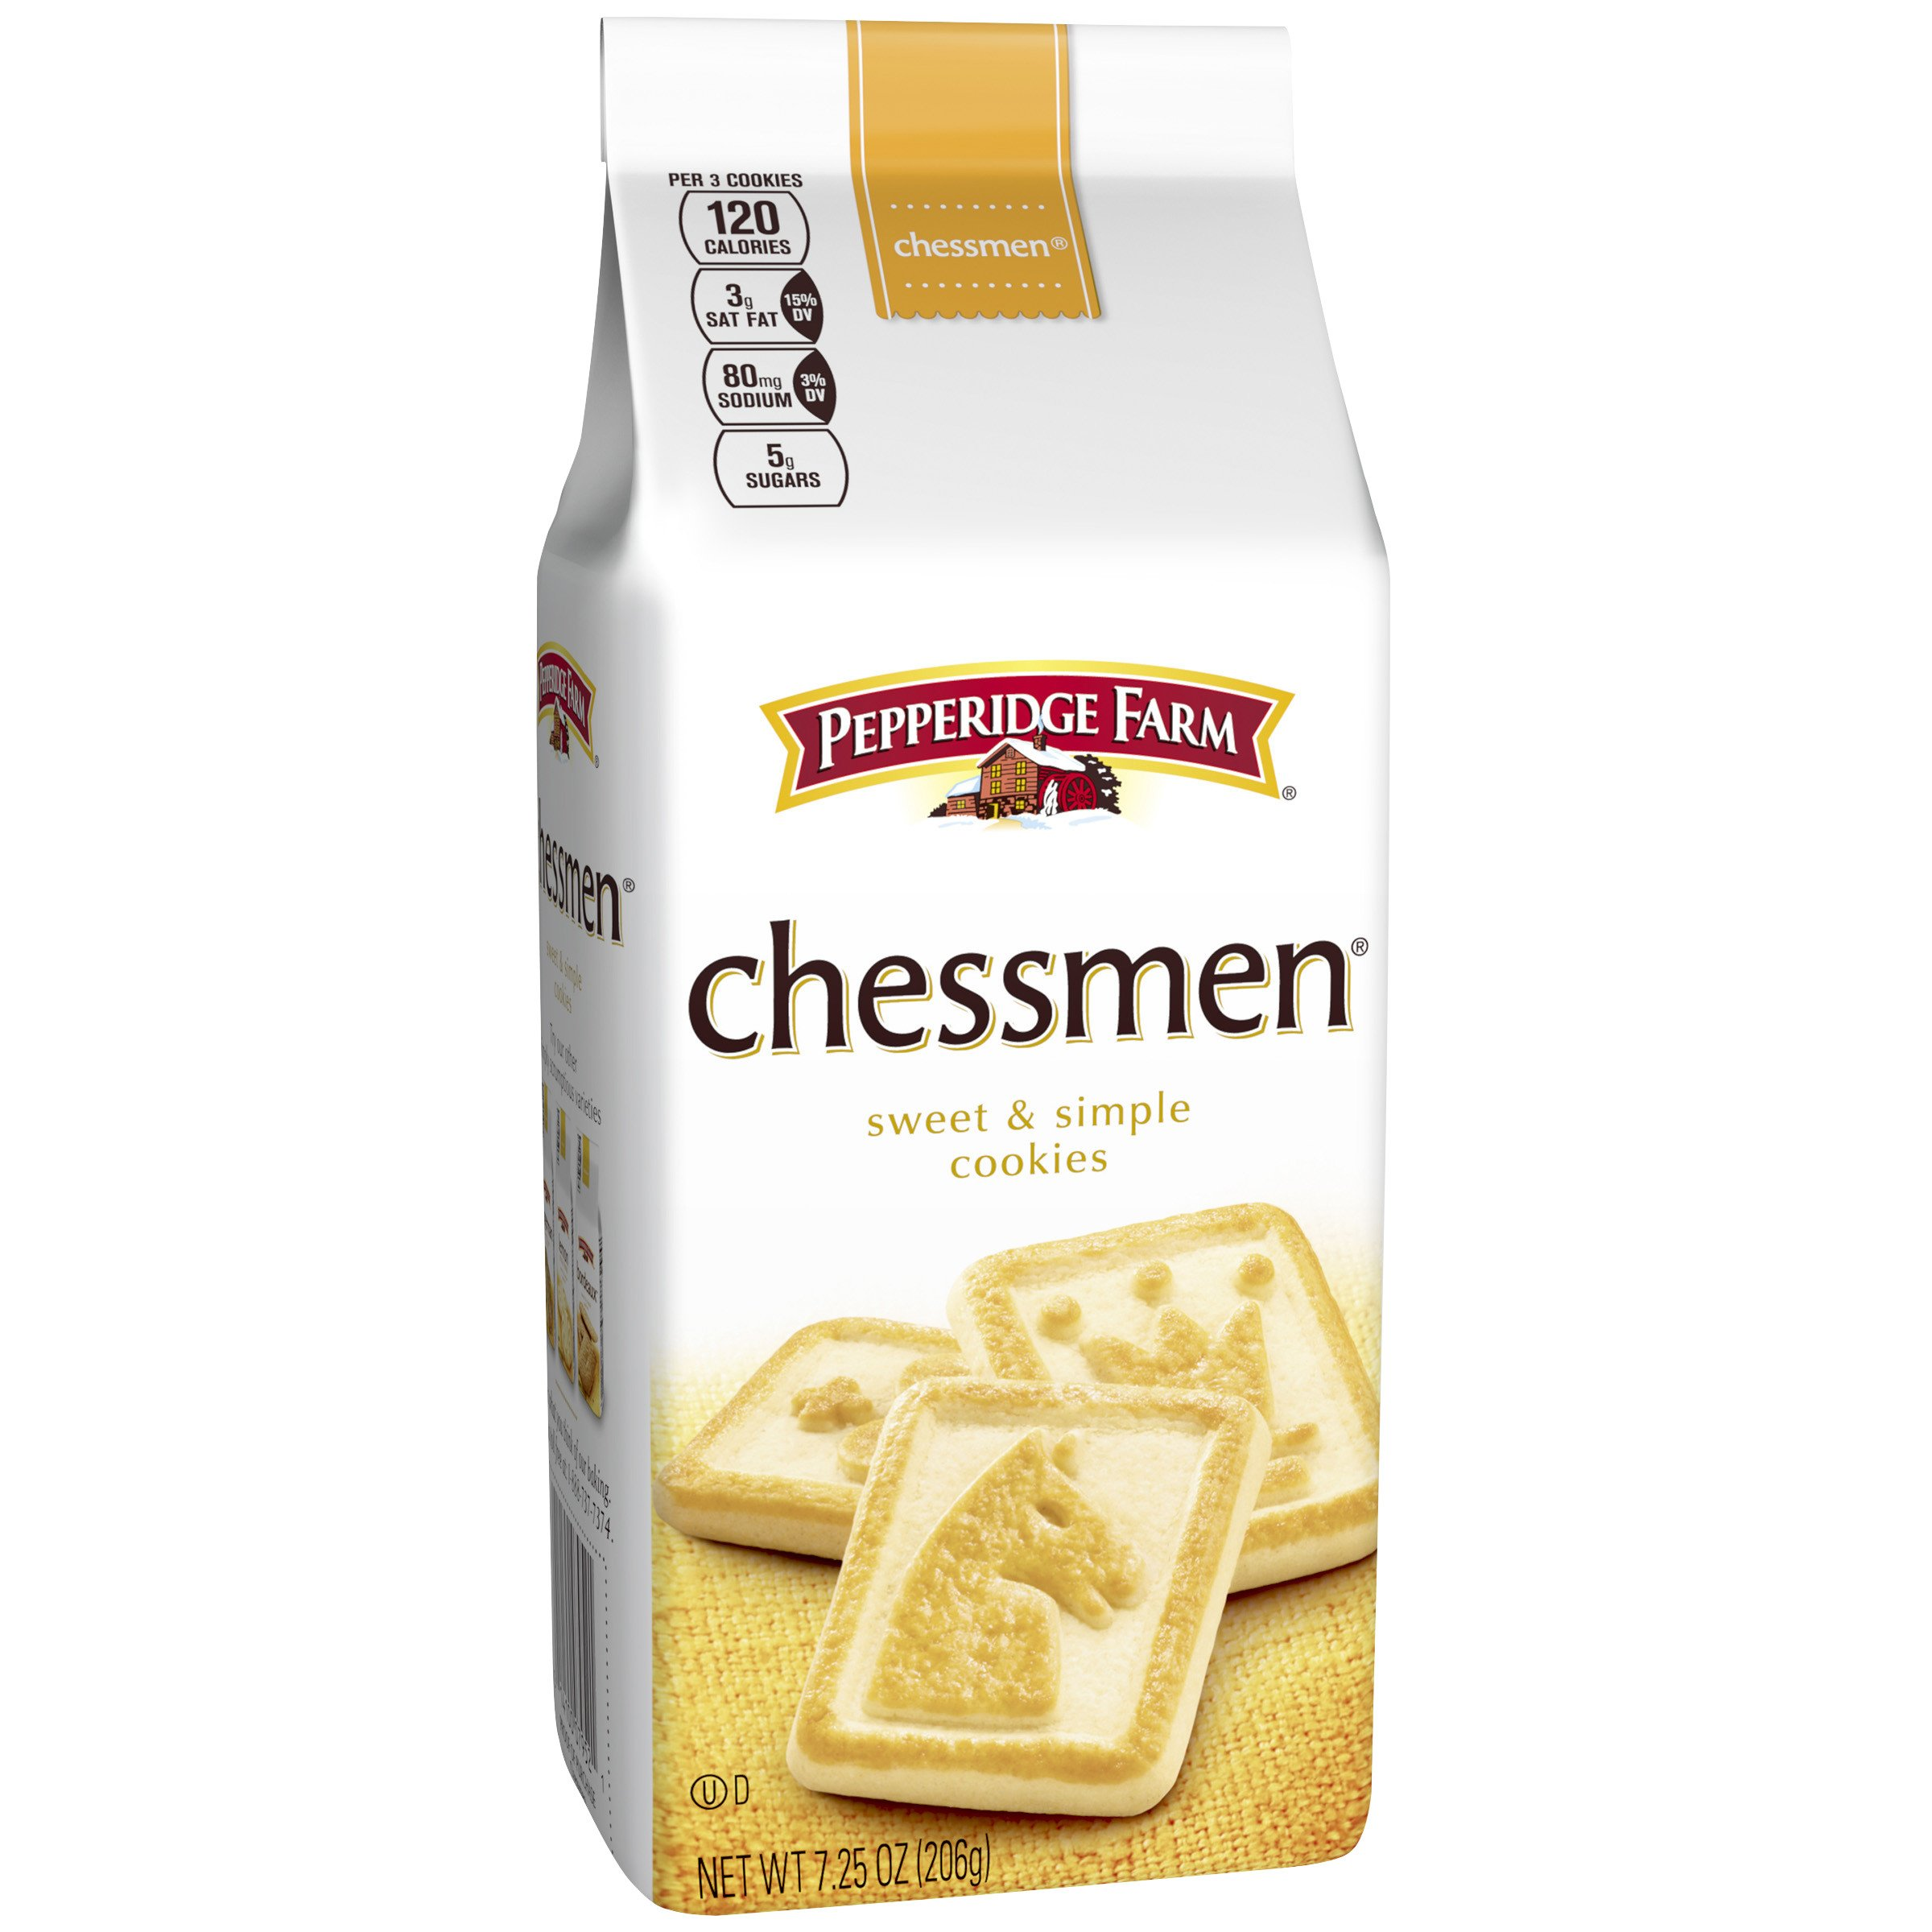 Pepperidge Farm, Chessmen, Cookies, 7.25 oz., Bag, 24-count